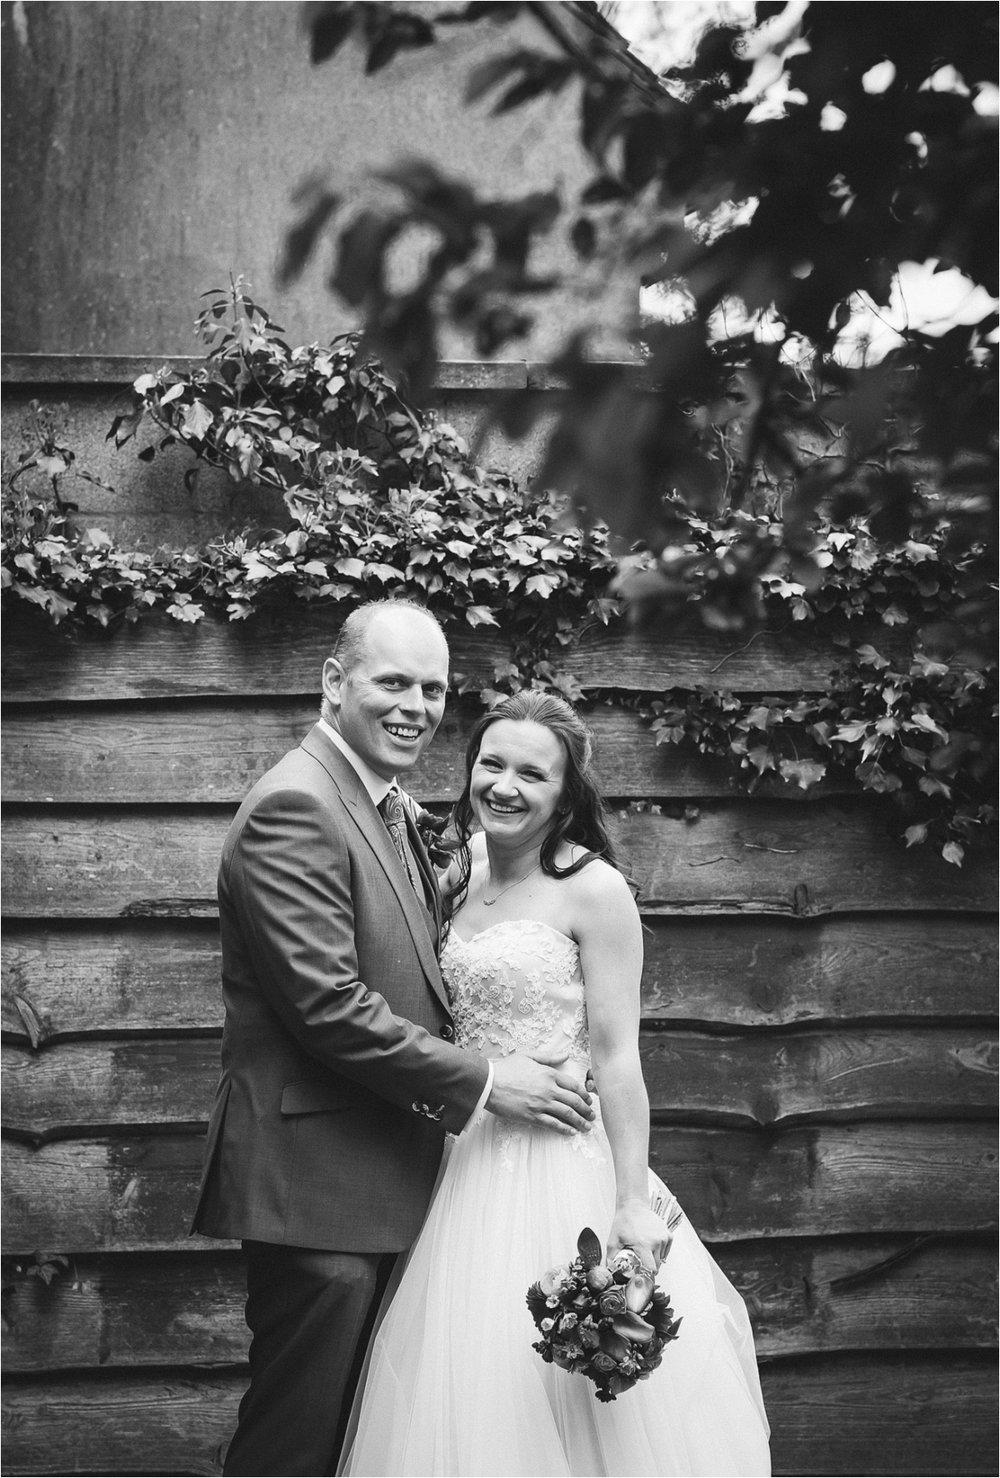 chris_emma_wedding_the_Fleece_inn_0074.jpg